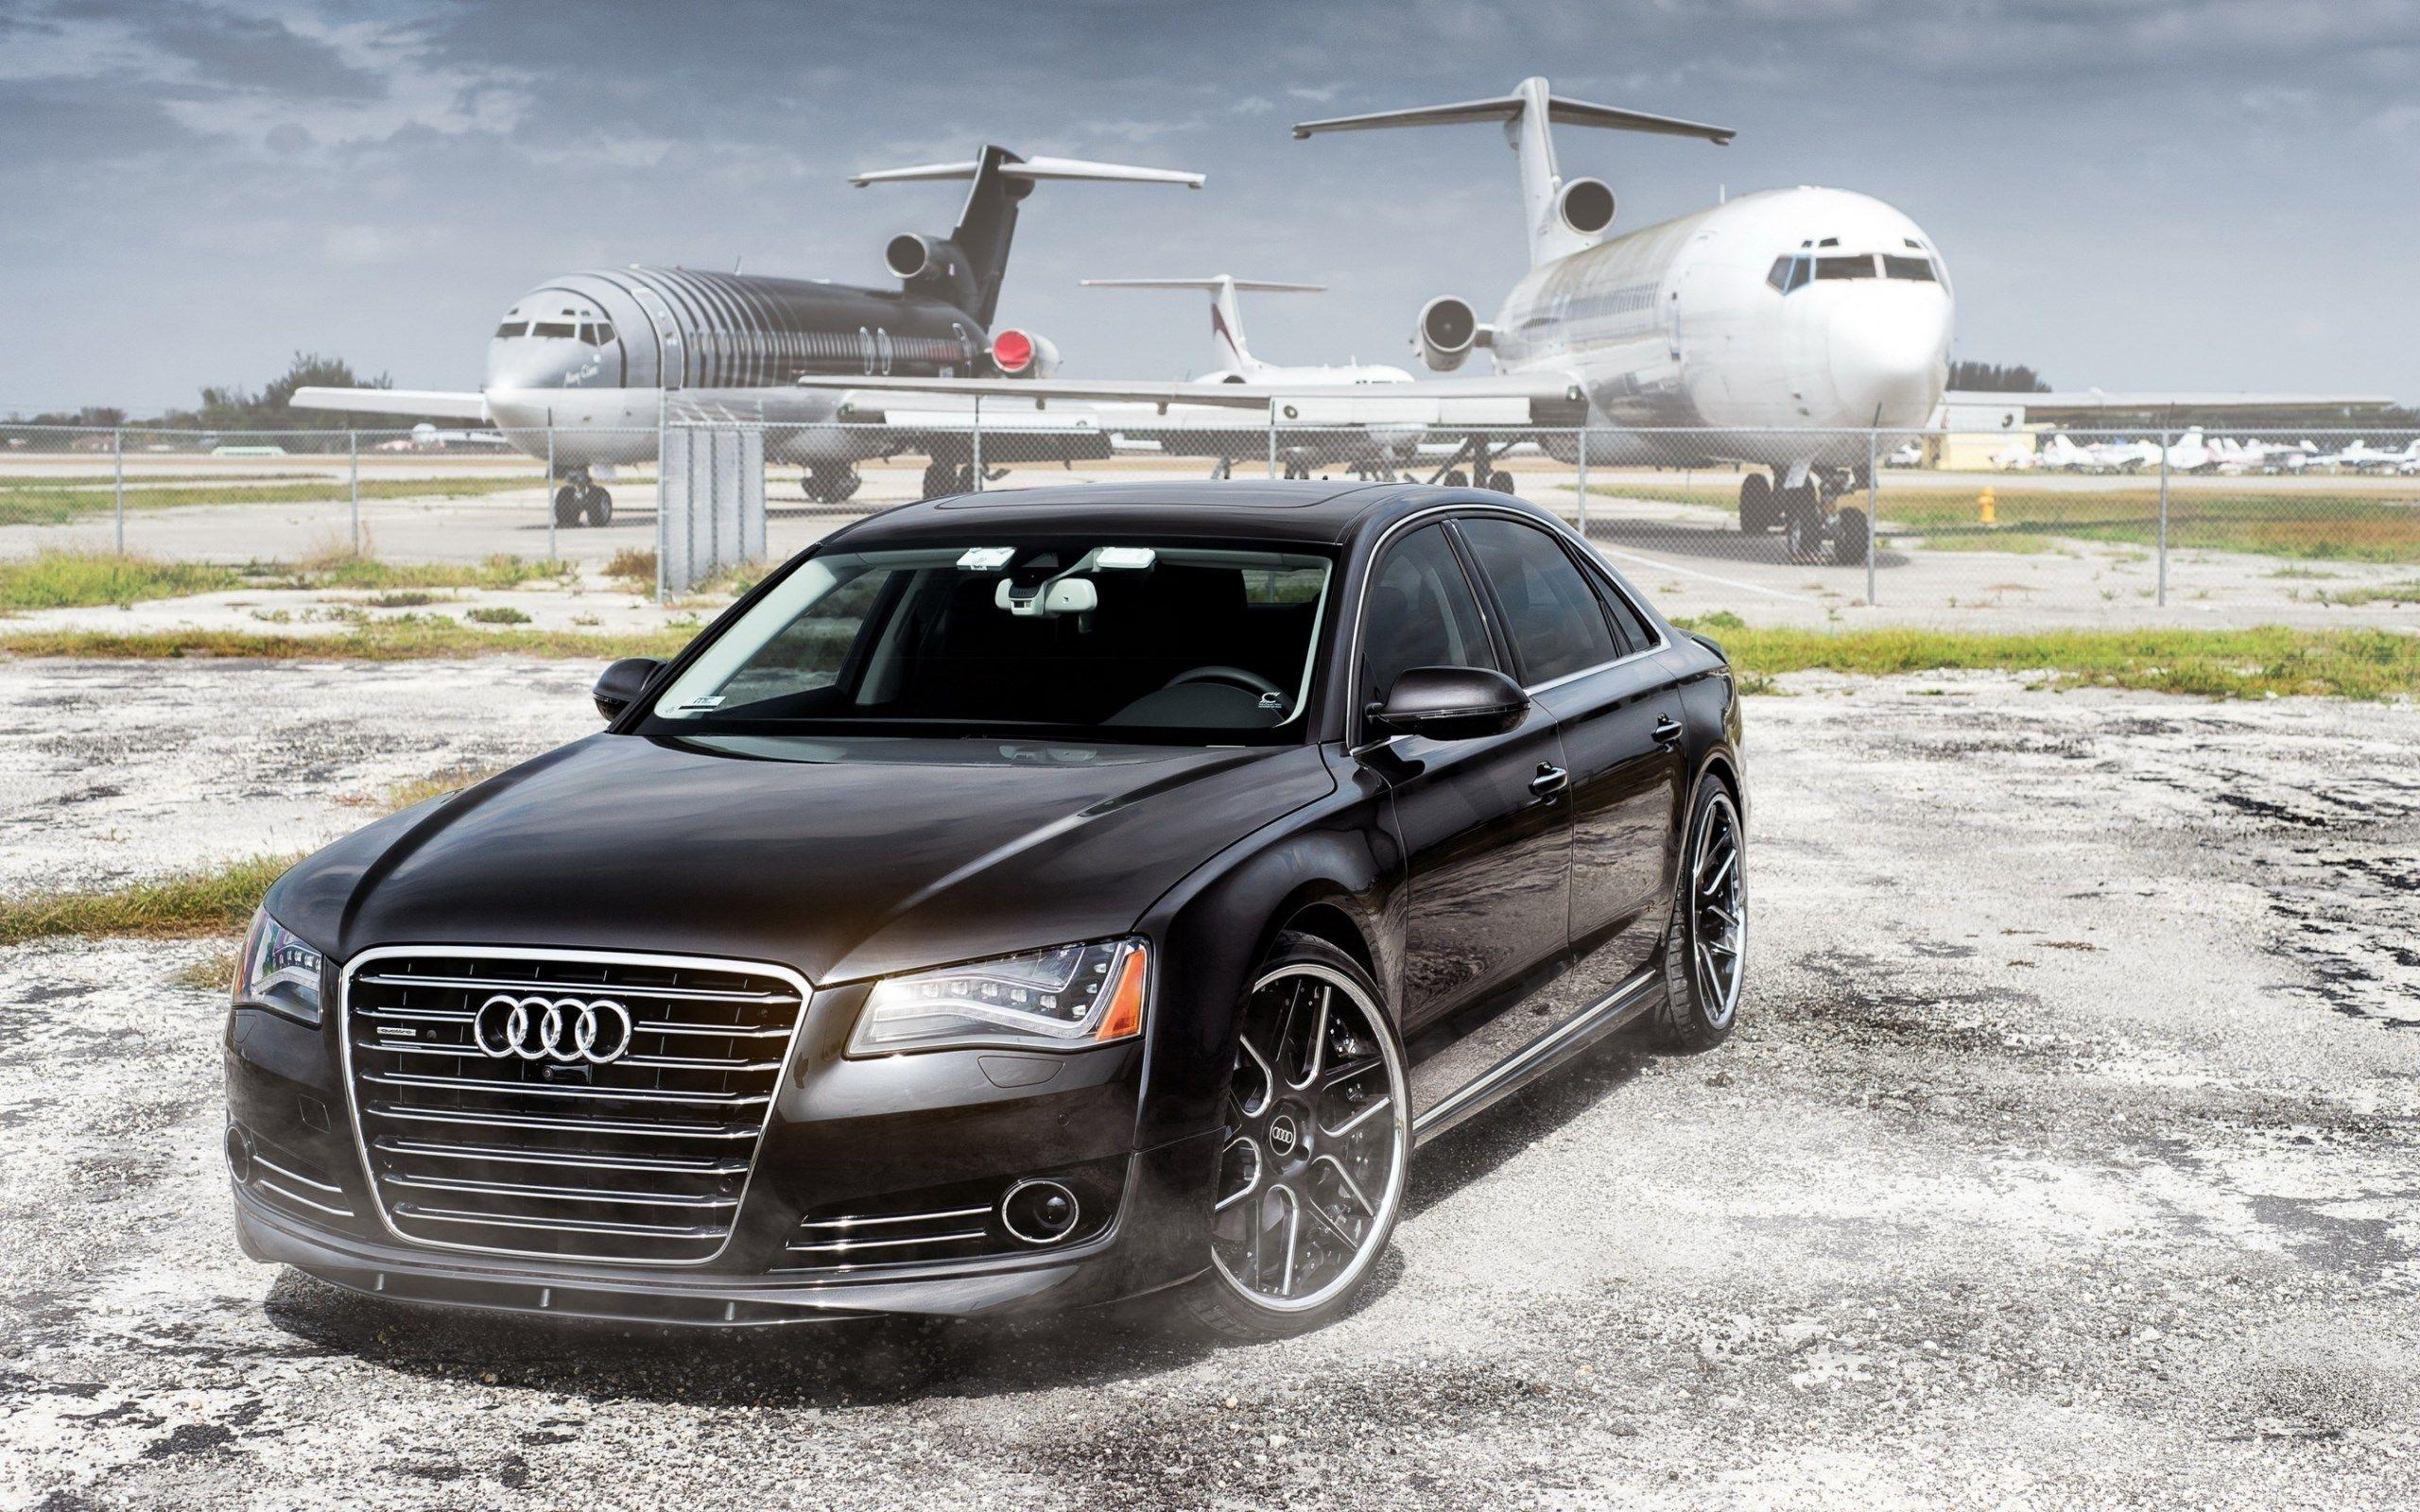 Audi A8 Pic 1080p High Quality Audi A8 Category Ololoshenka